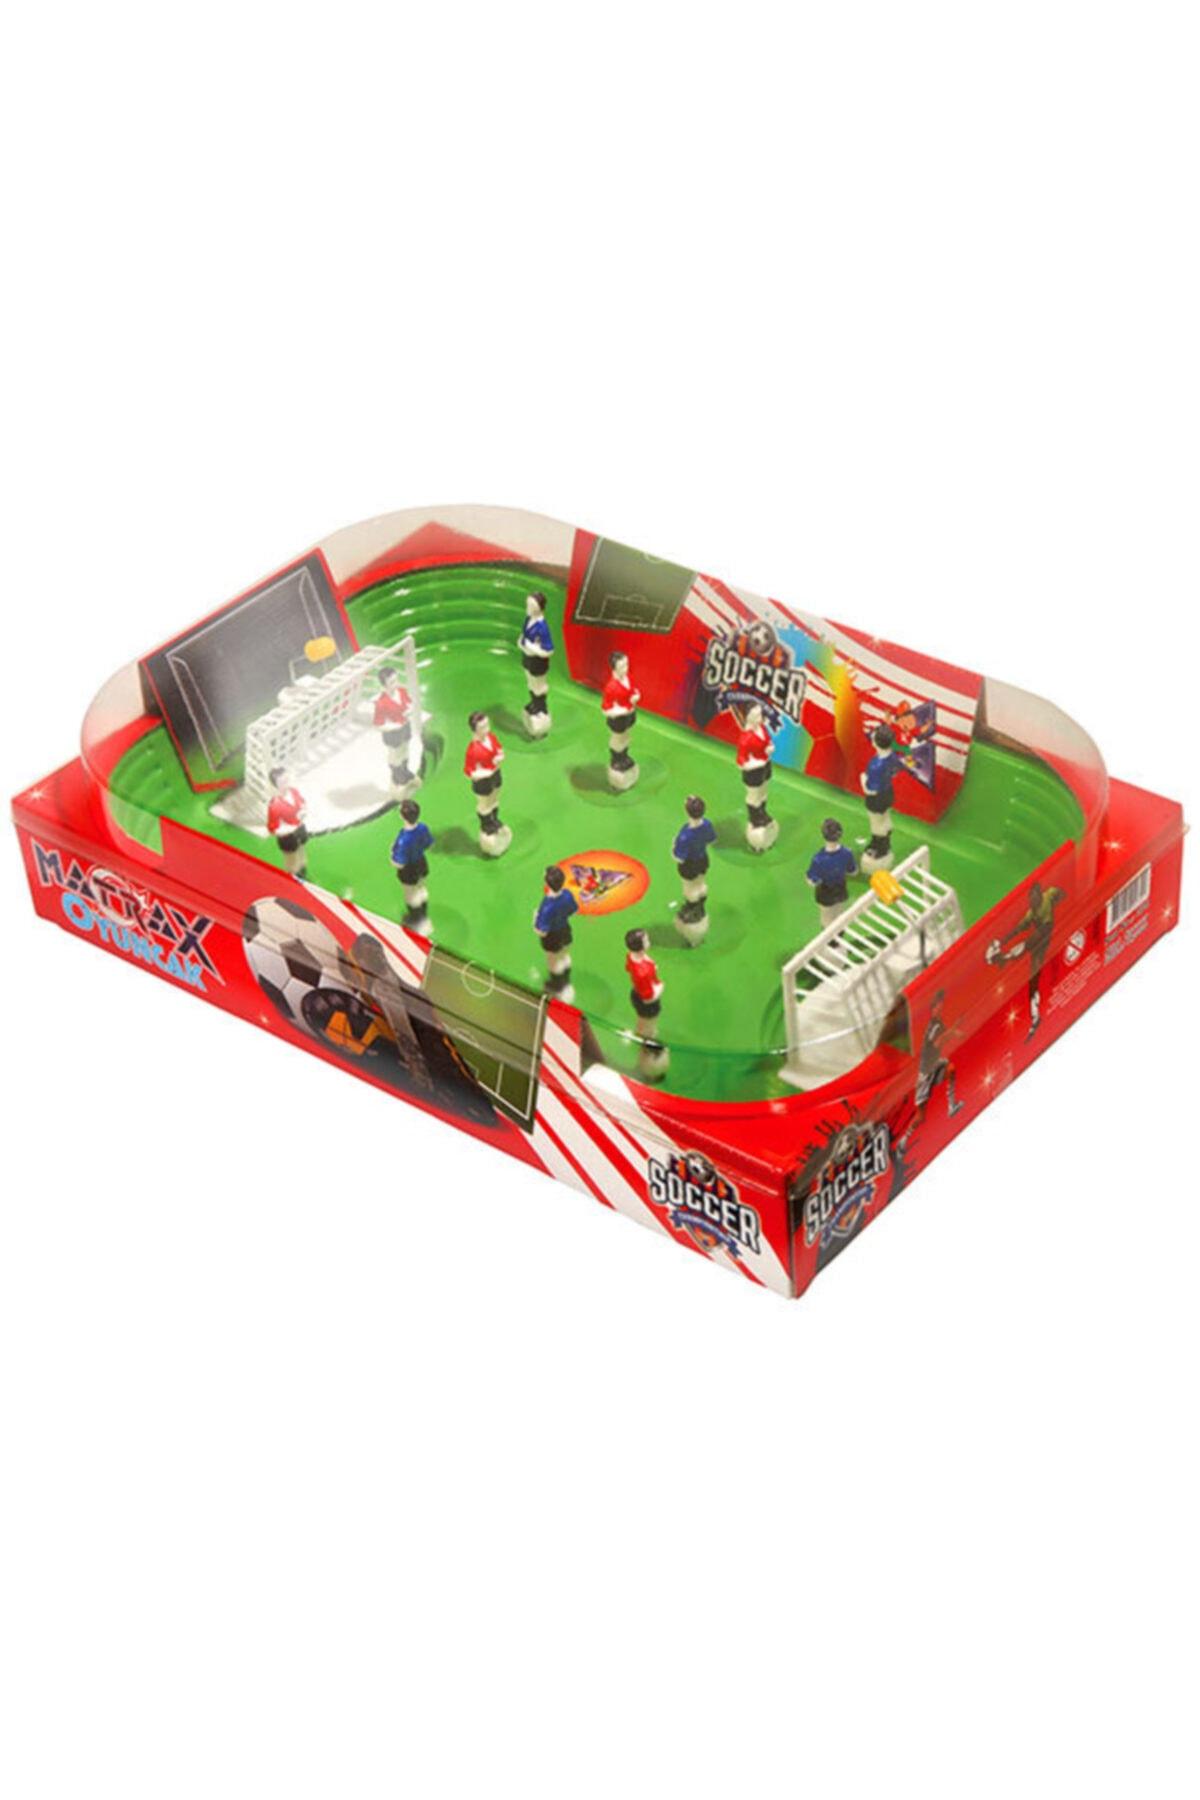 Matrax Mini Futbol Oyunu Oyuncak Akc-034 1